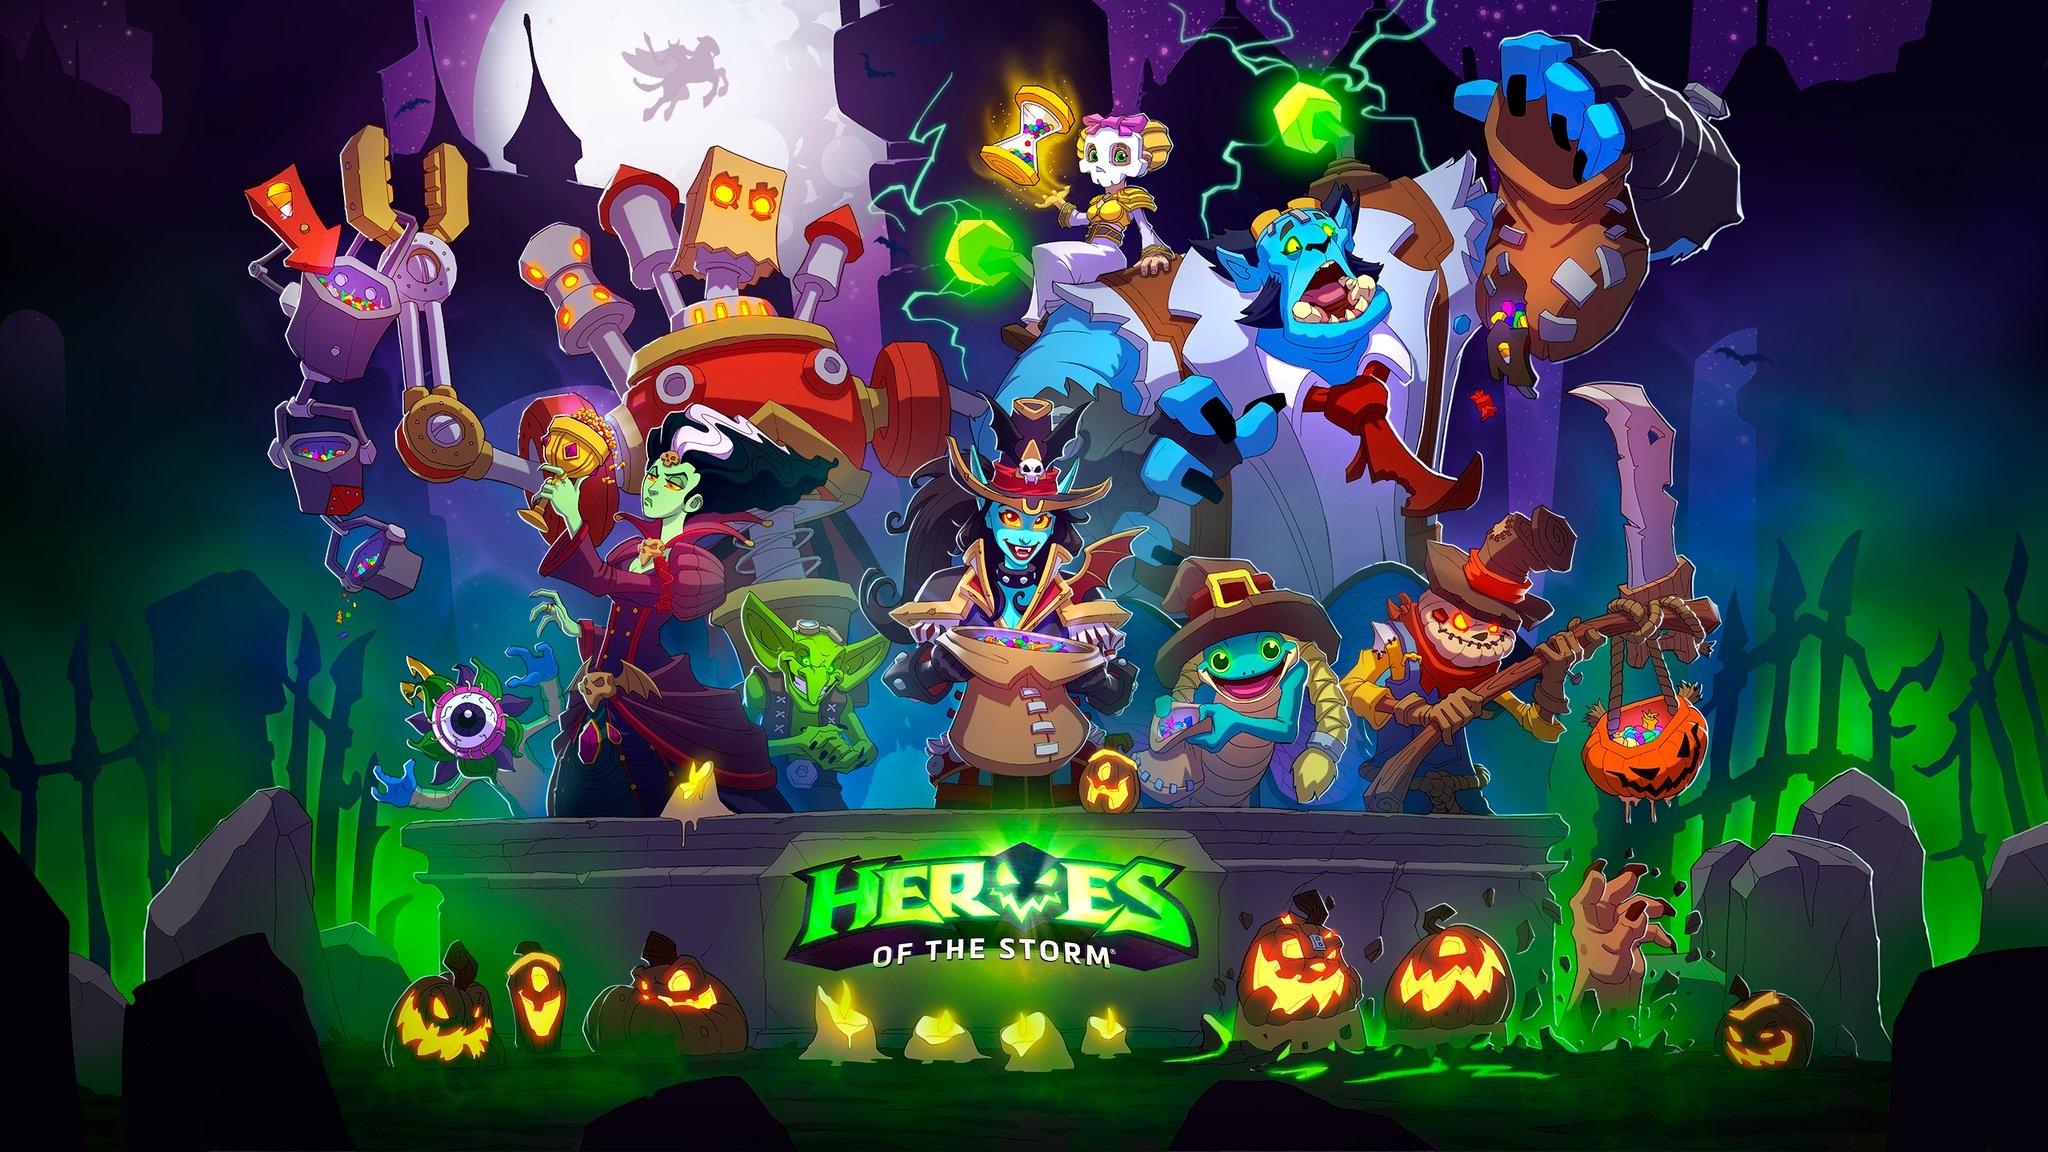 General 2048x1152 video games heroes of the storm Halloween Warcraft Diablo cartoon artwork digital art spooky pumpkin